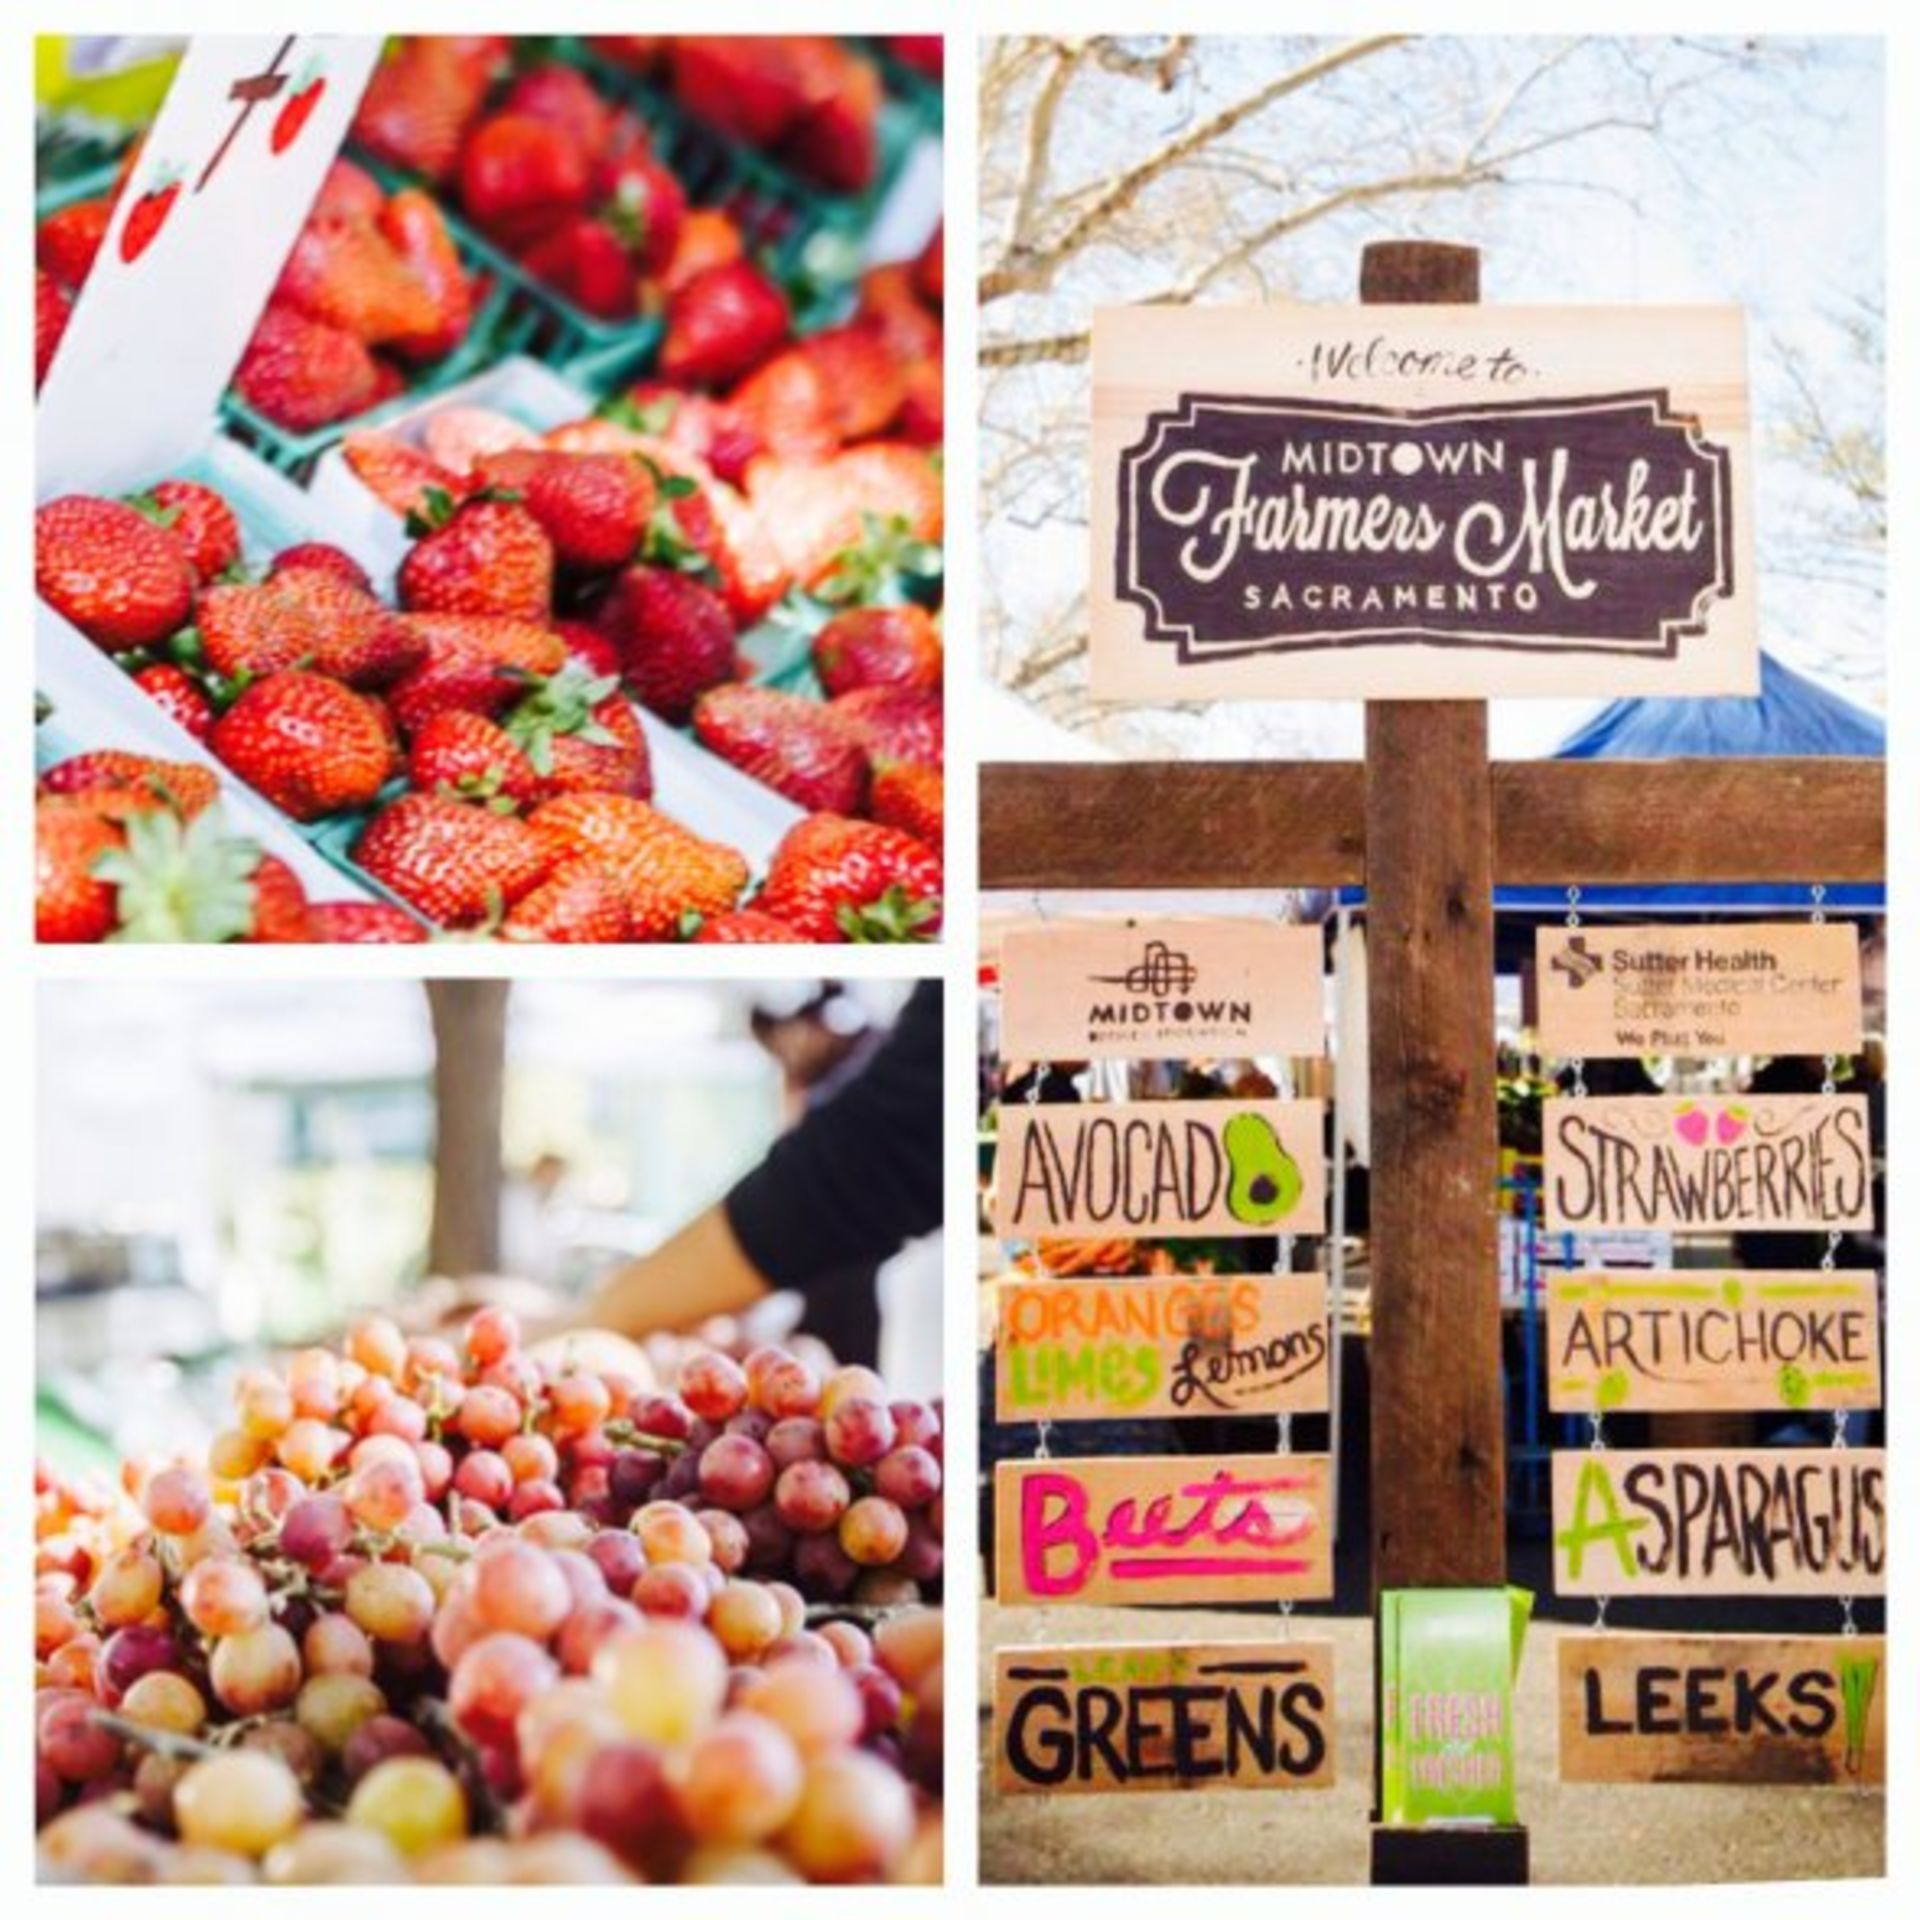 Farmers' Markets in the Sacramento Region